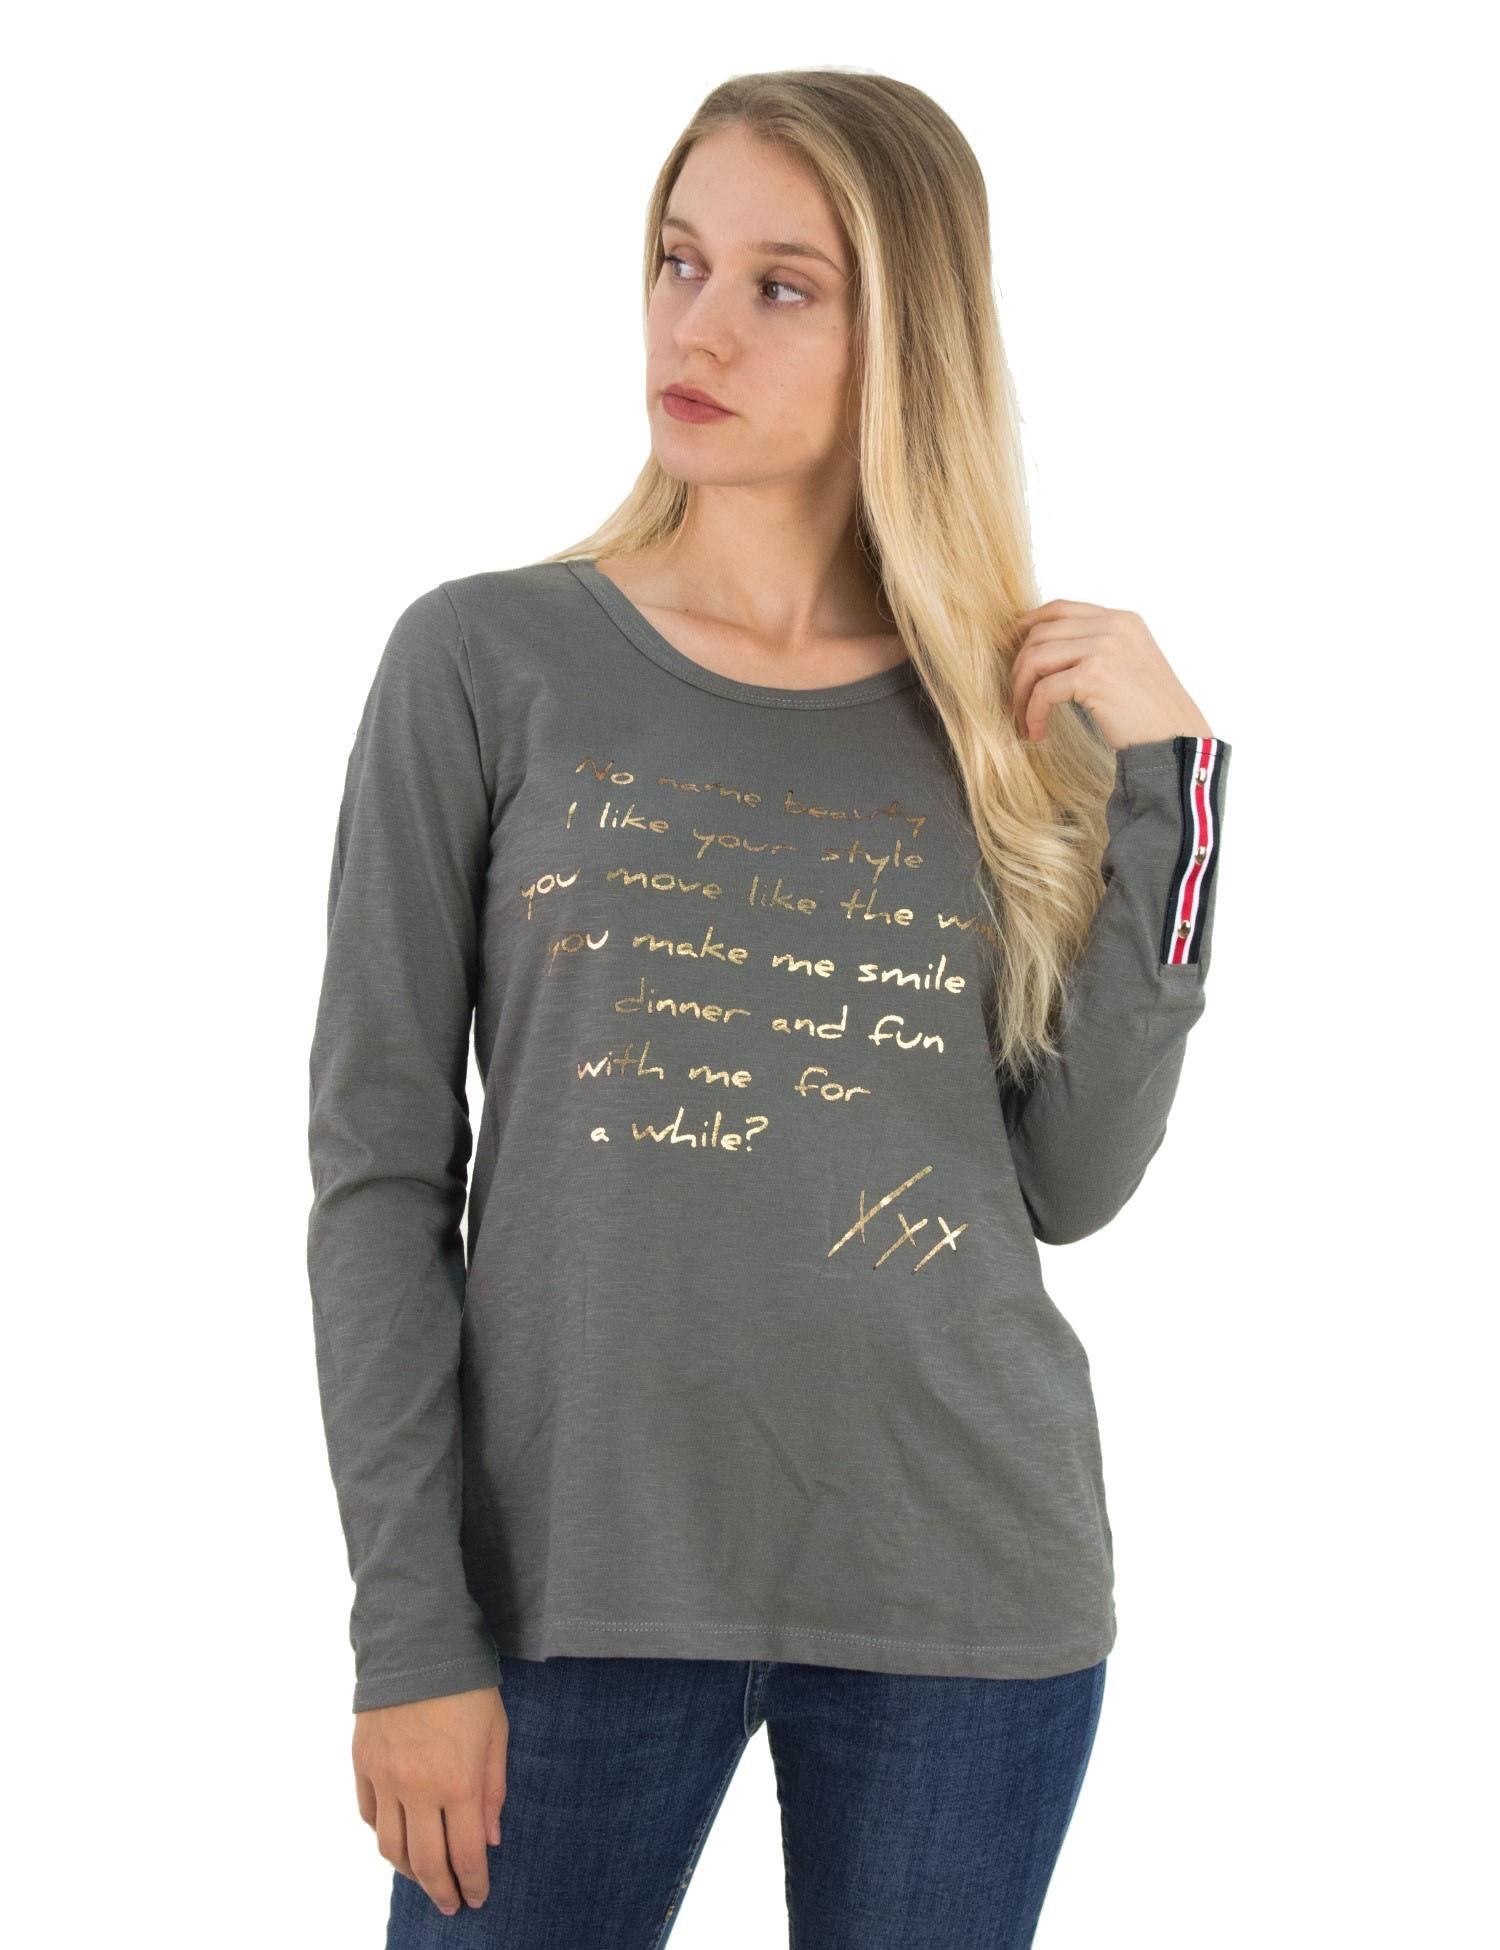 03f92b8aa045 Γυναικεία γκρι βαμβακερή μπλούζα Lipsy μονόχρωμη 2180006V - Glami.gr